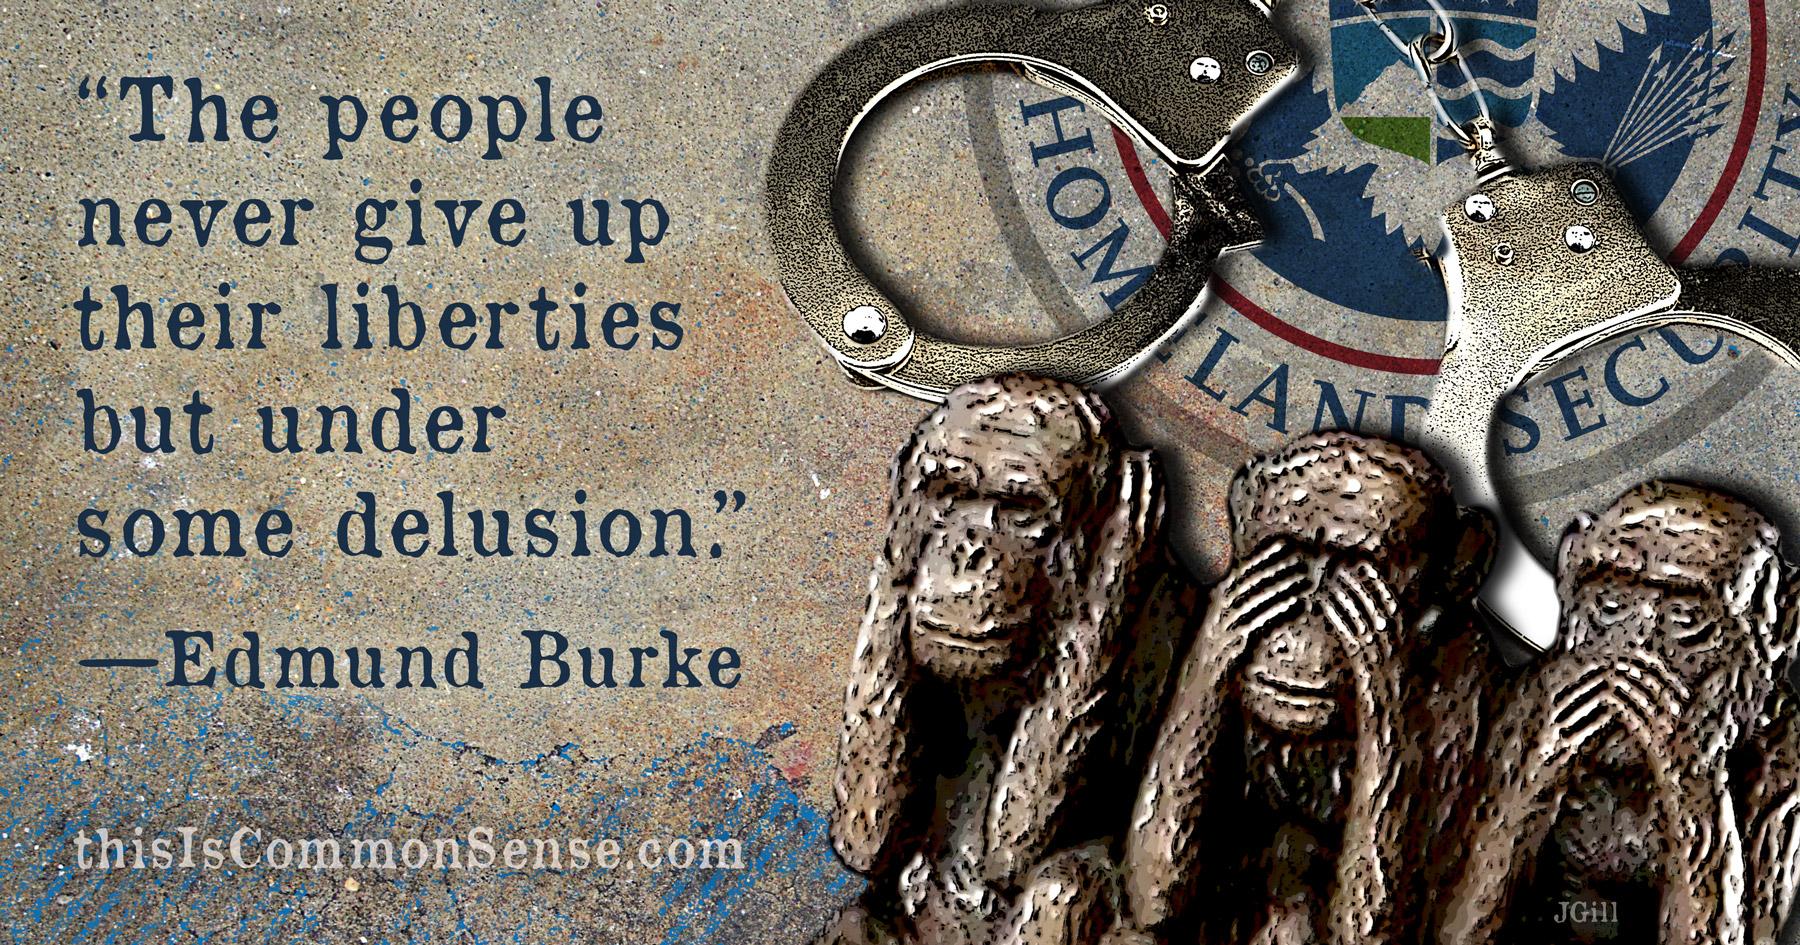 Edmund Burke, quotation, meme, collage, photomontage, Paul Jacob, http://cognitivebiasparade.prosite.com/